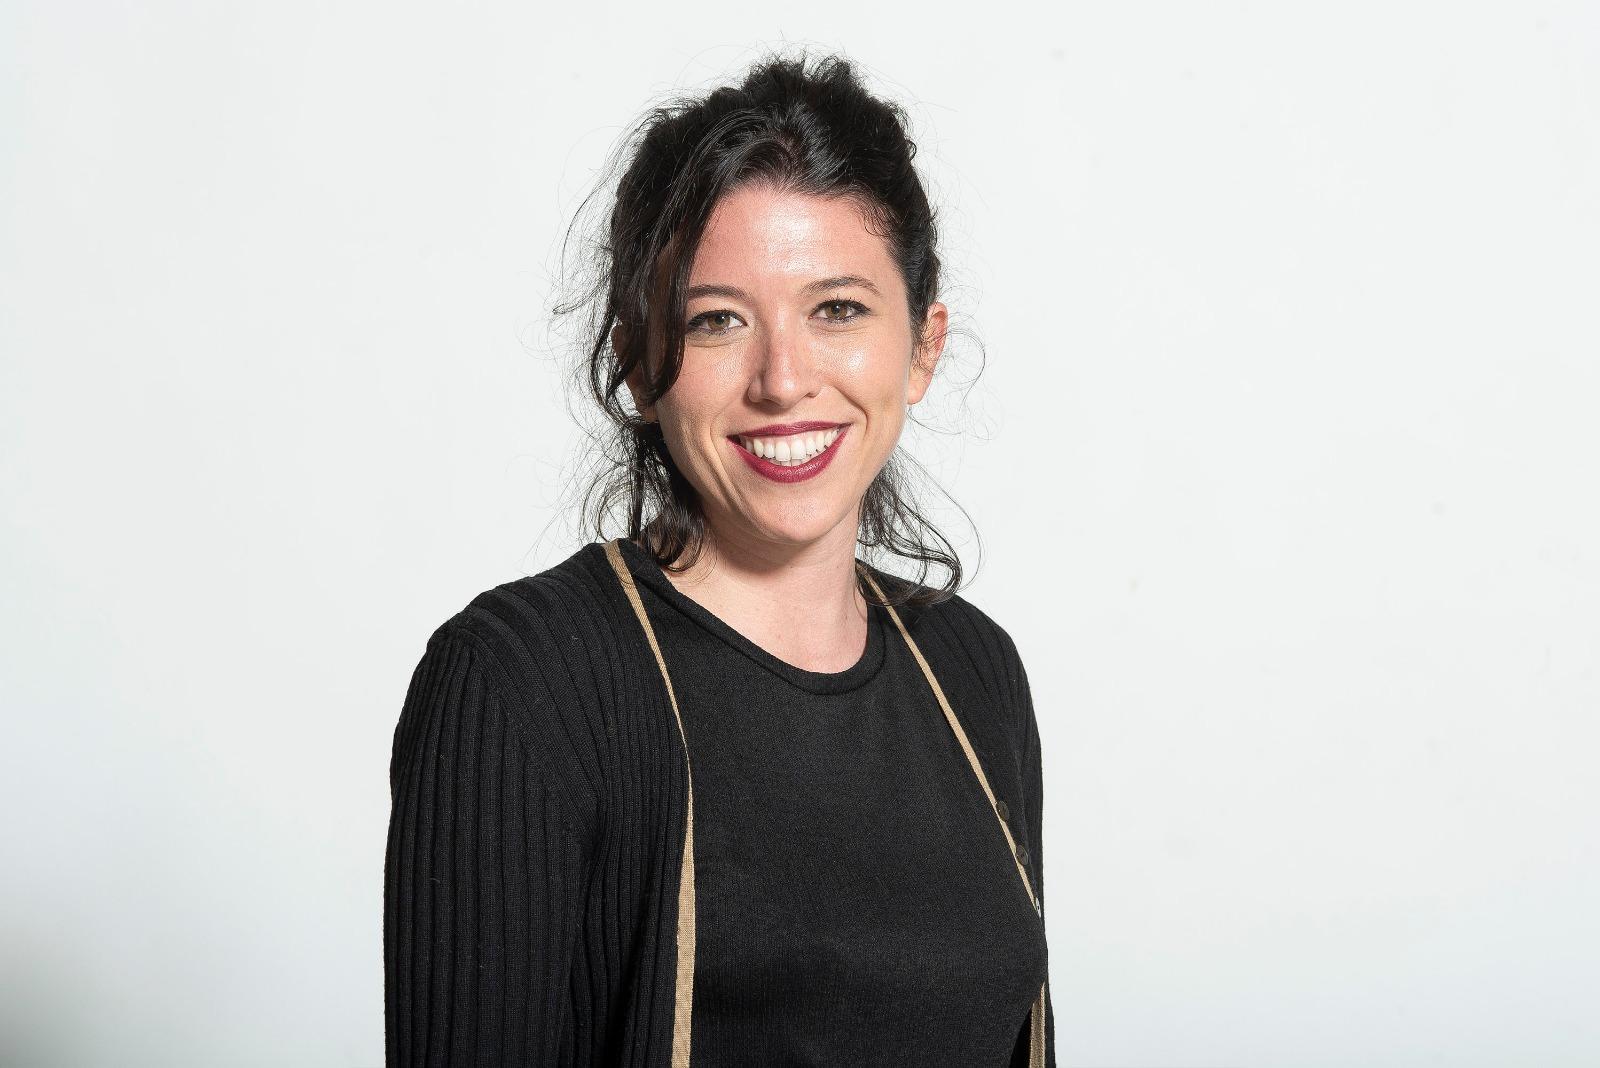 Carolina Pezzini